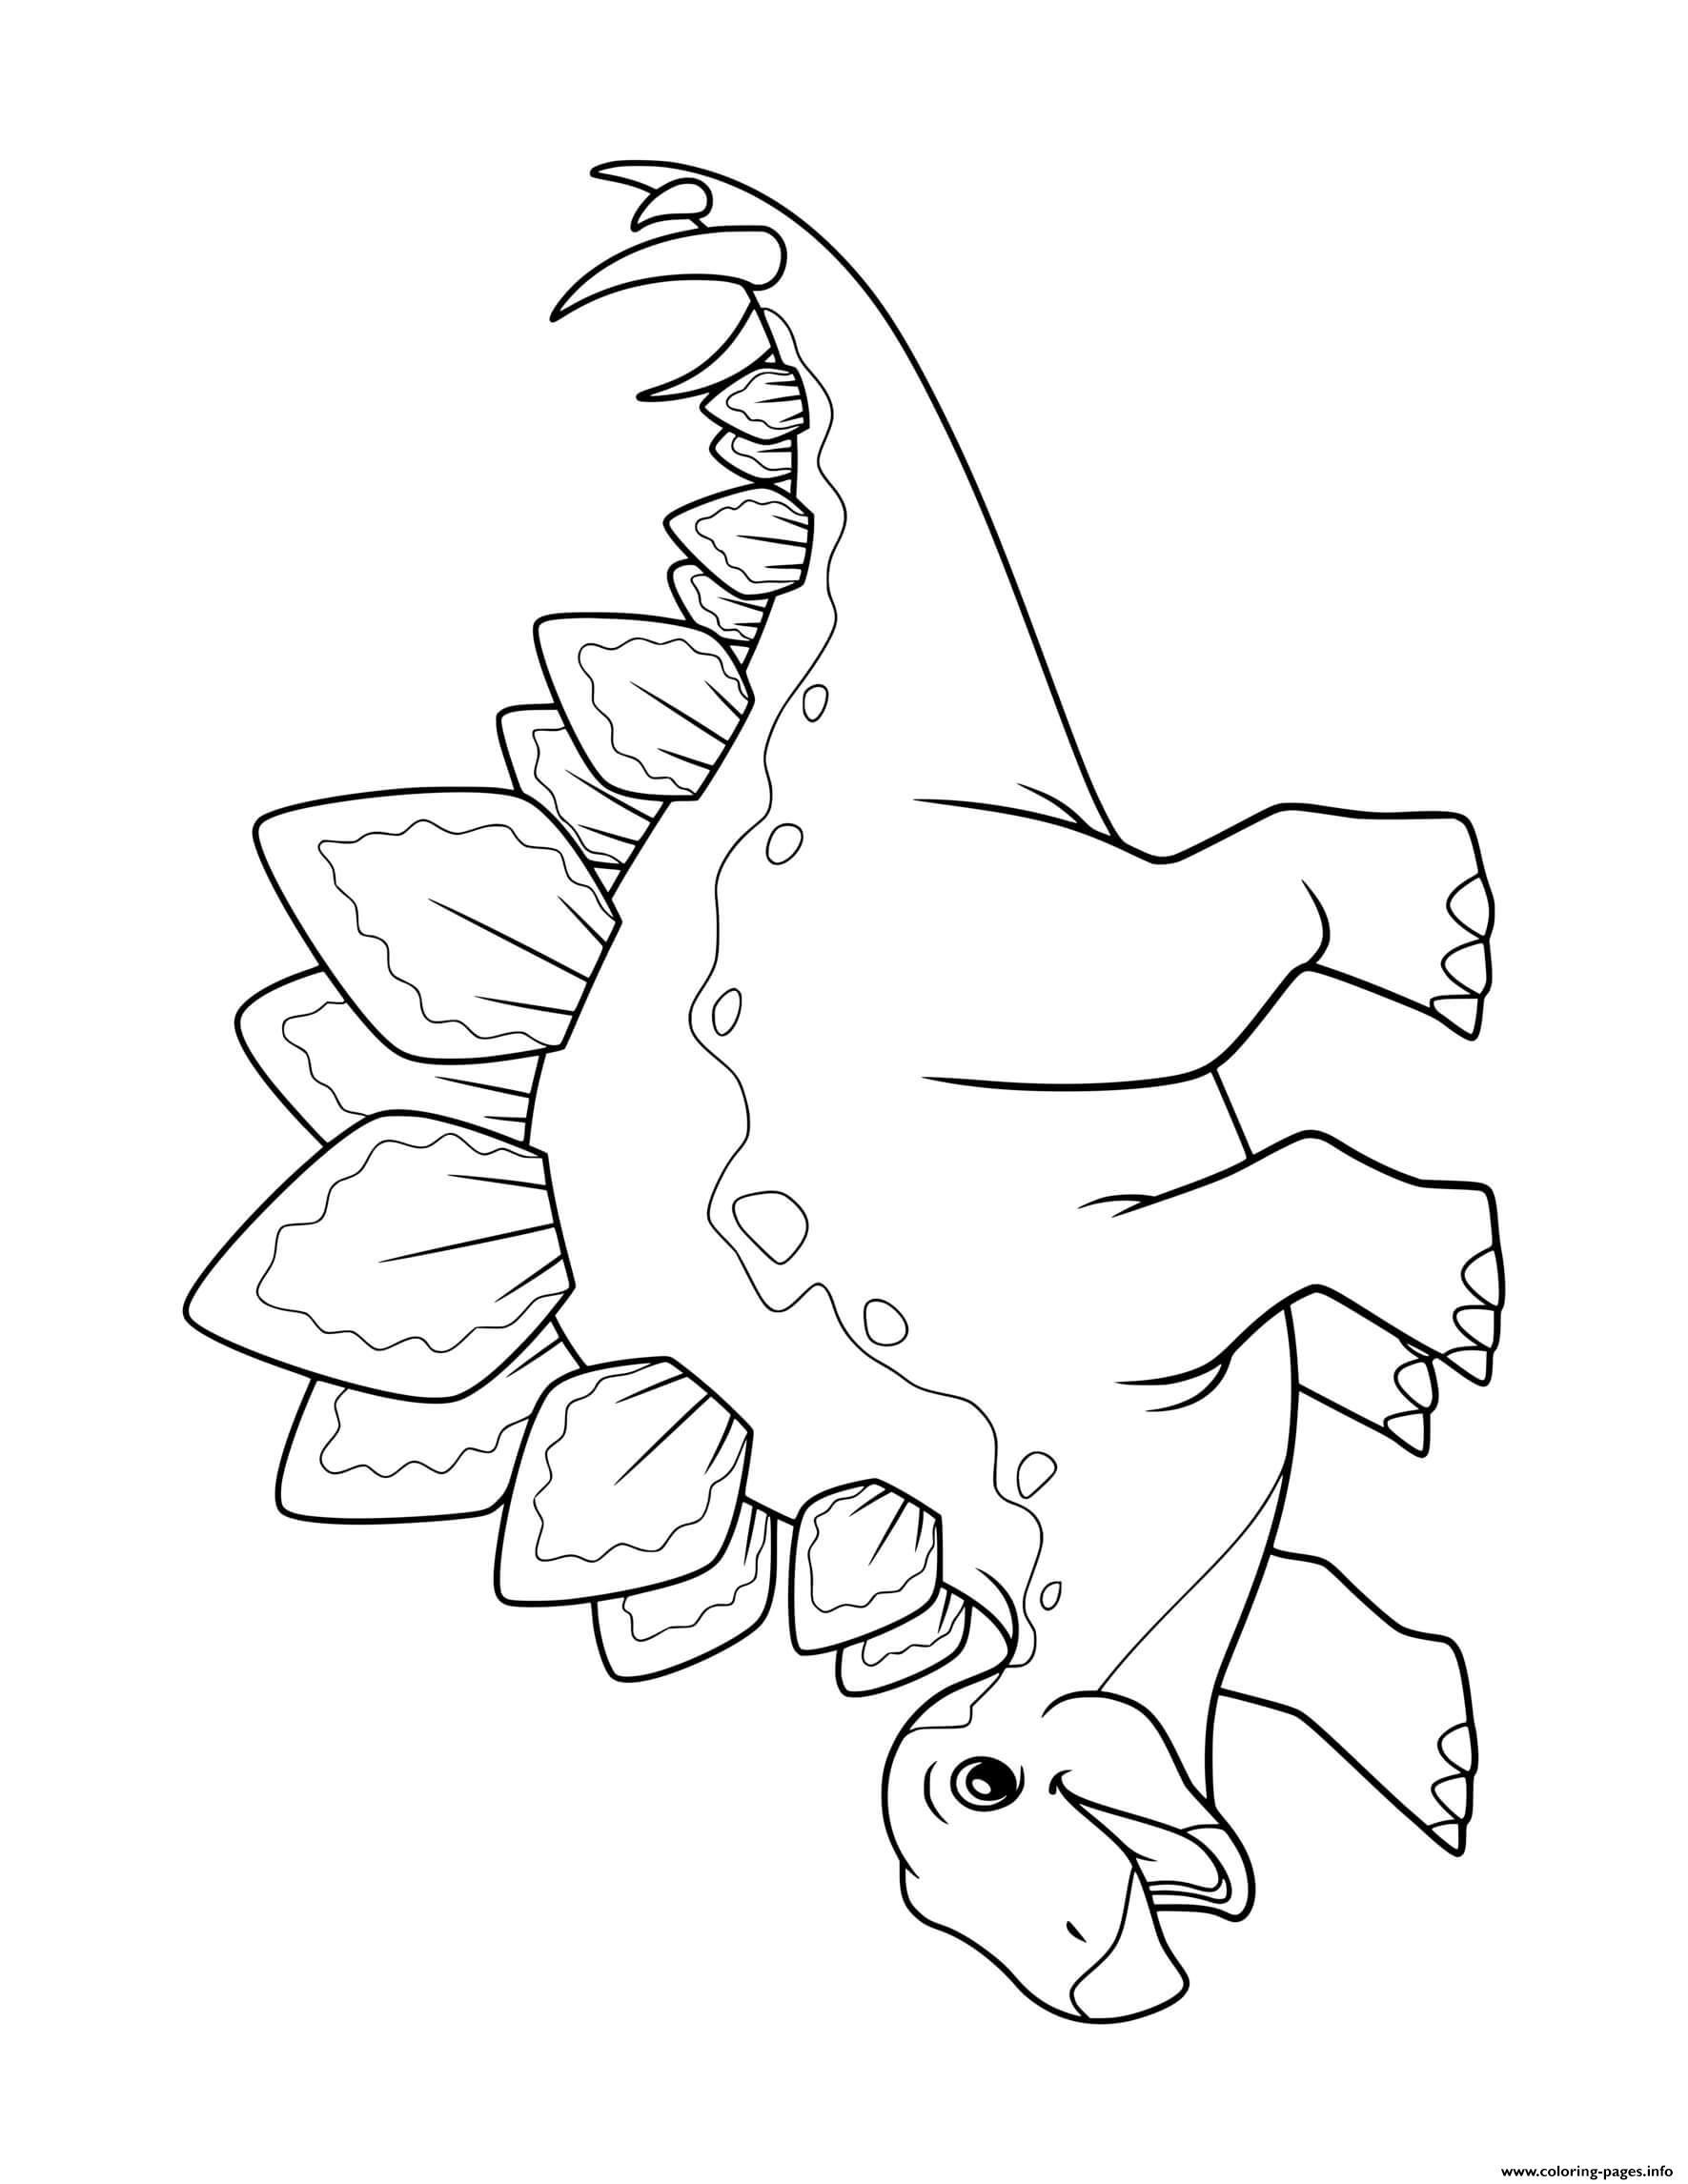 Dinosaur Stegosaurus For Preschoolers Coloring Pages Printable